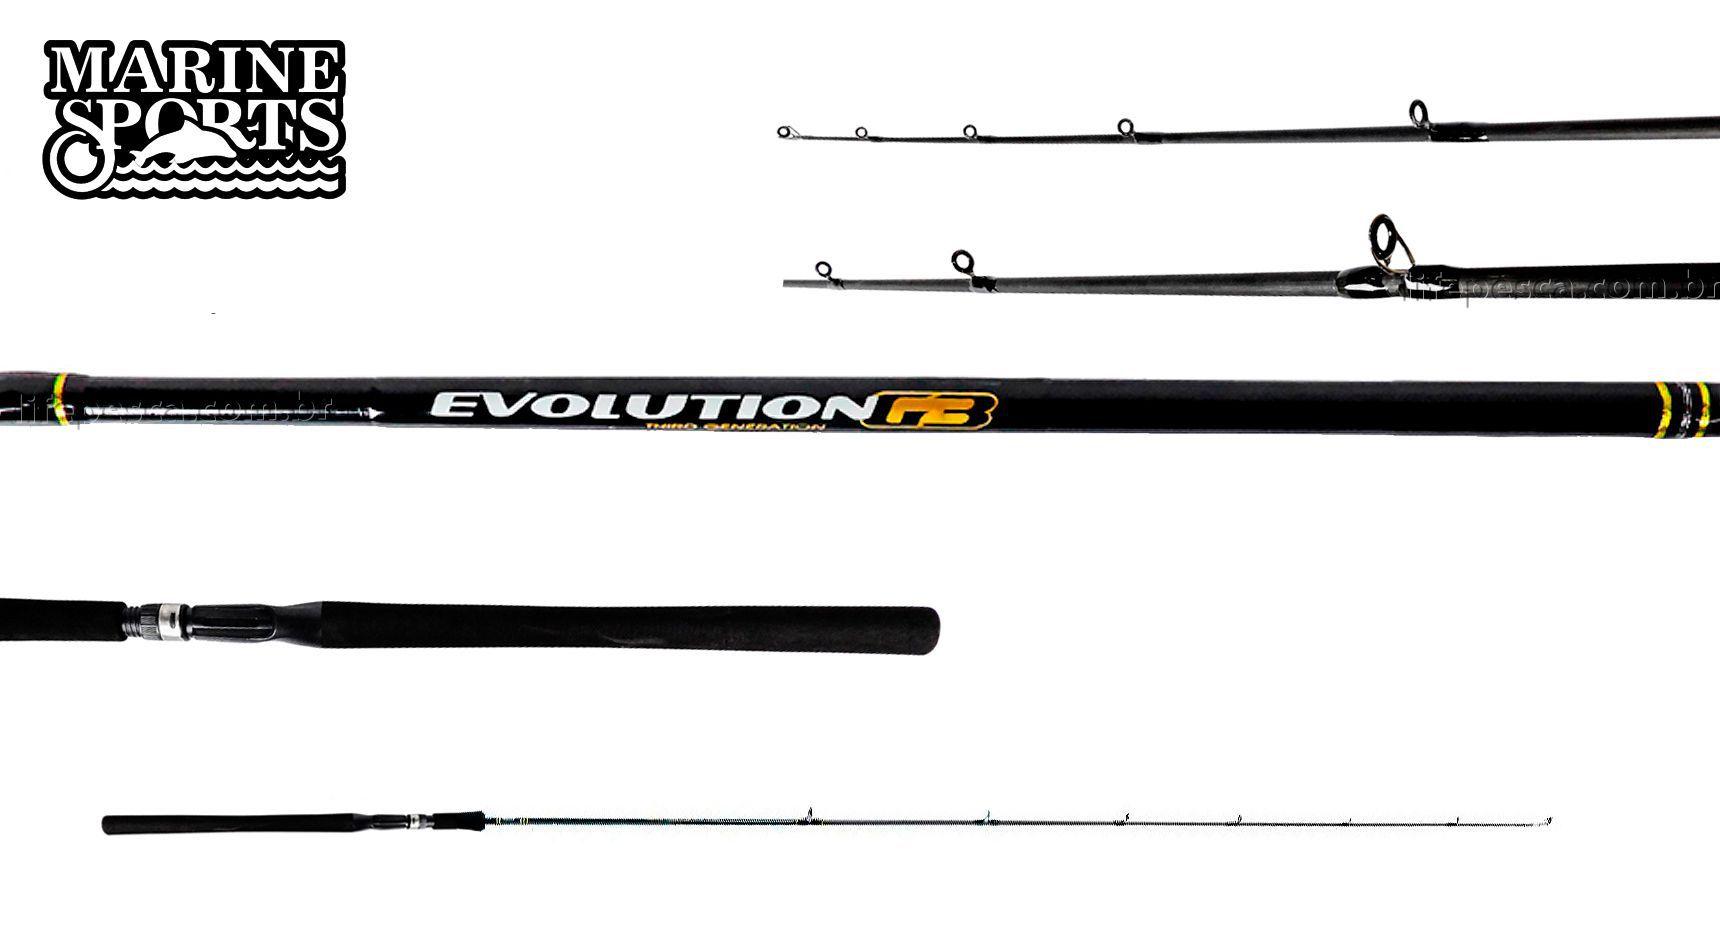 Vara para Molinete Marine sports Evolution G3 6